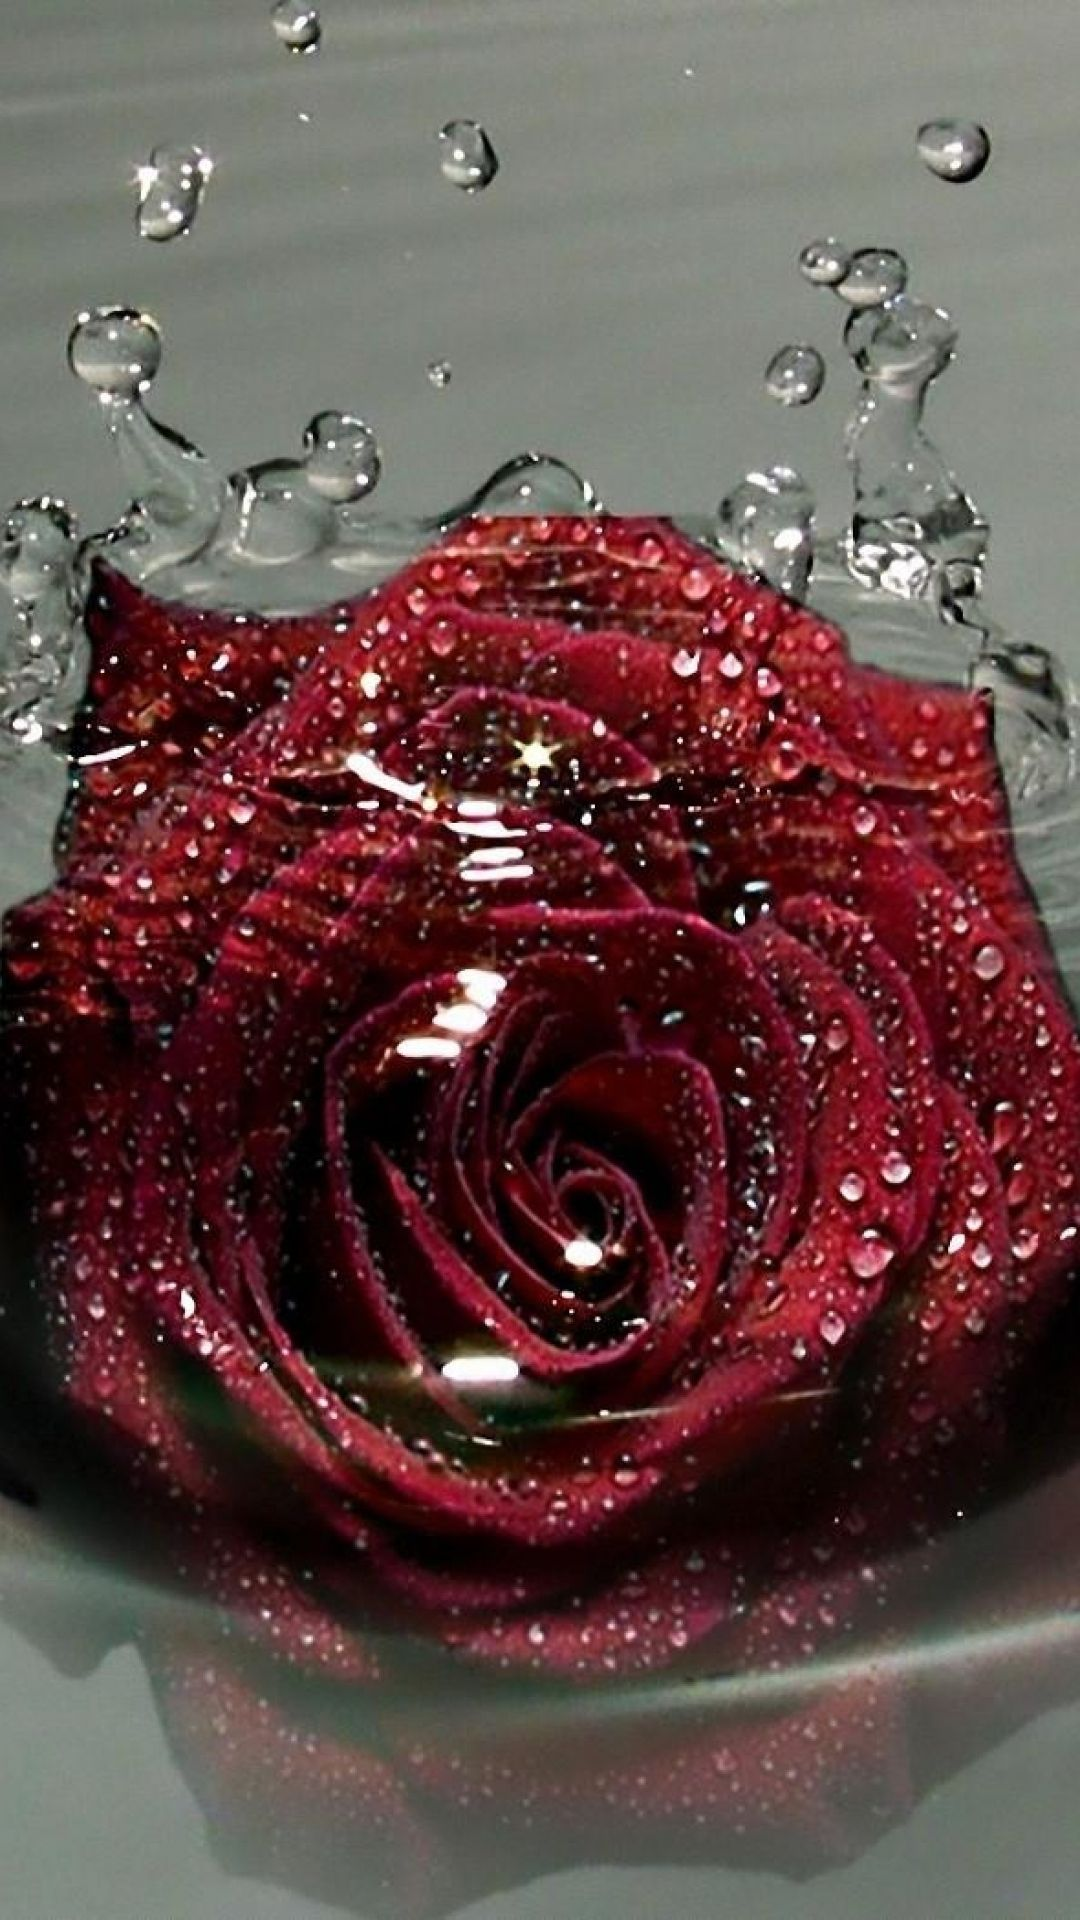 download wallpaper 1080x1920 rose flower bud drops sprays water